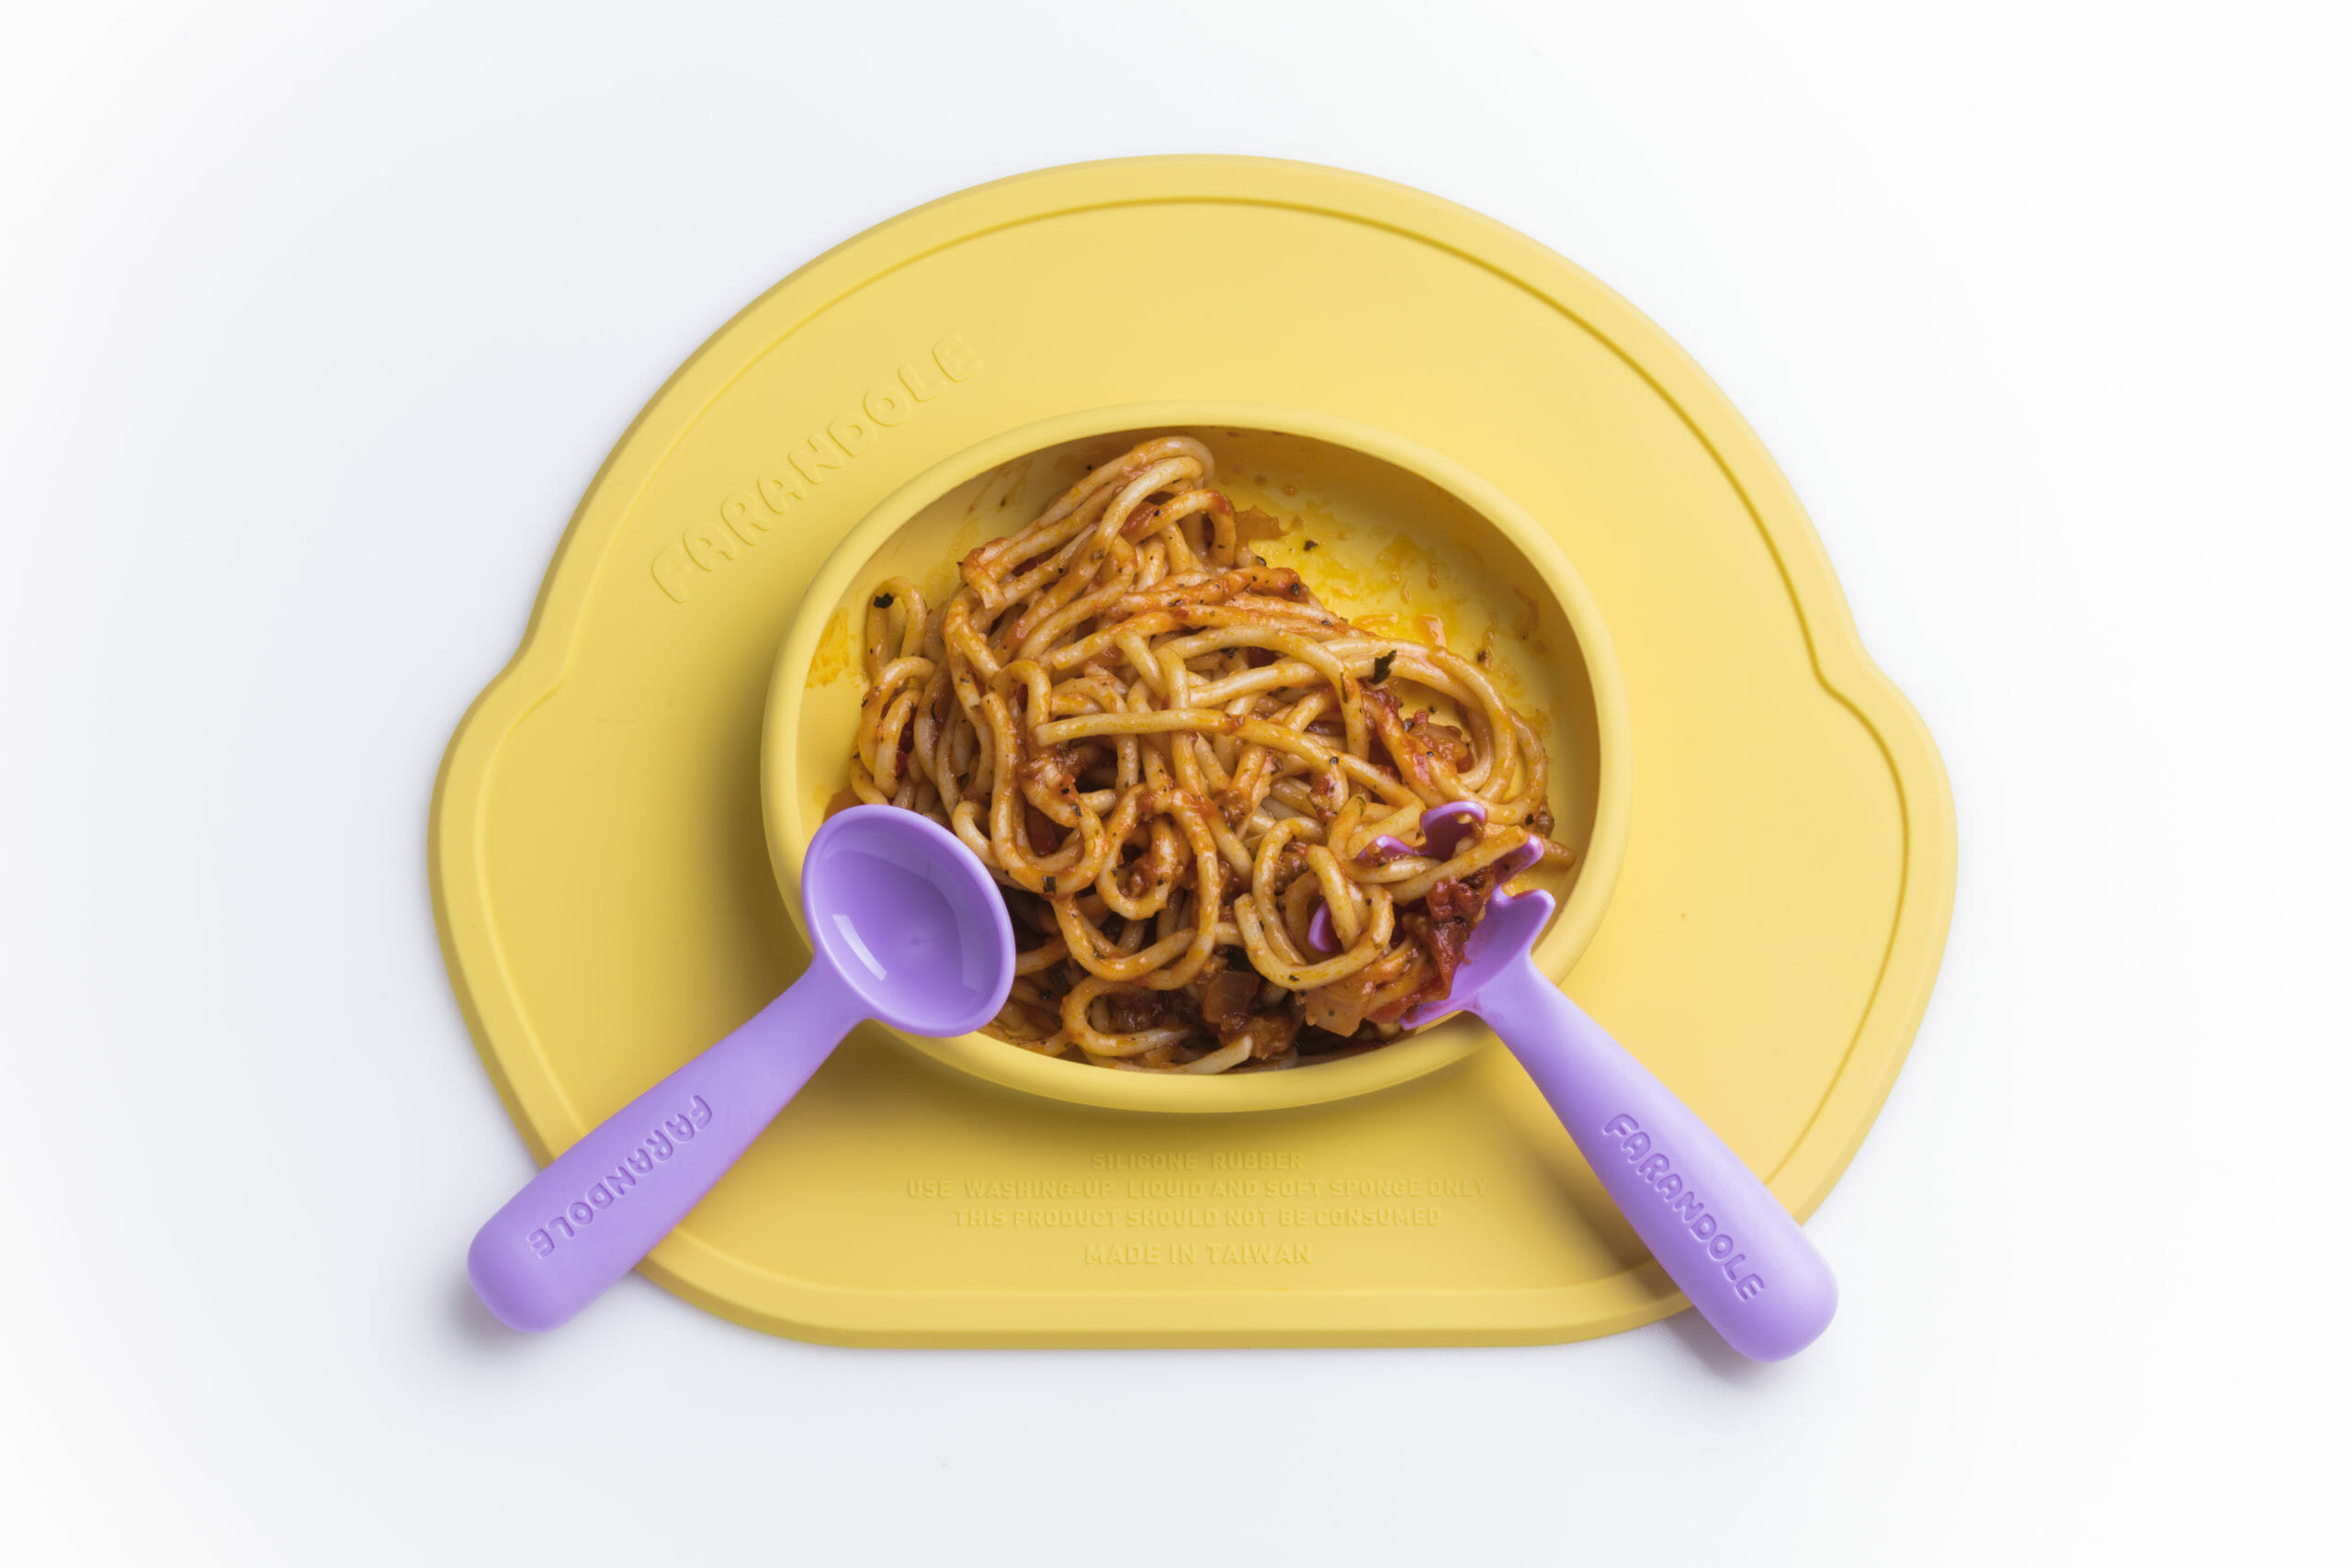 Farandole小麵撈 & 小湯匙聰明學習餐具組 15